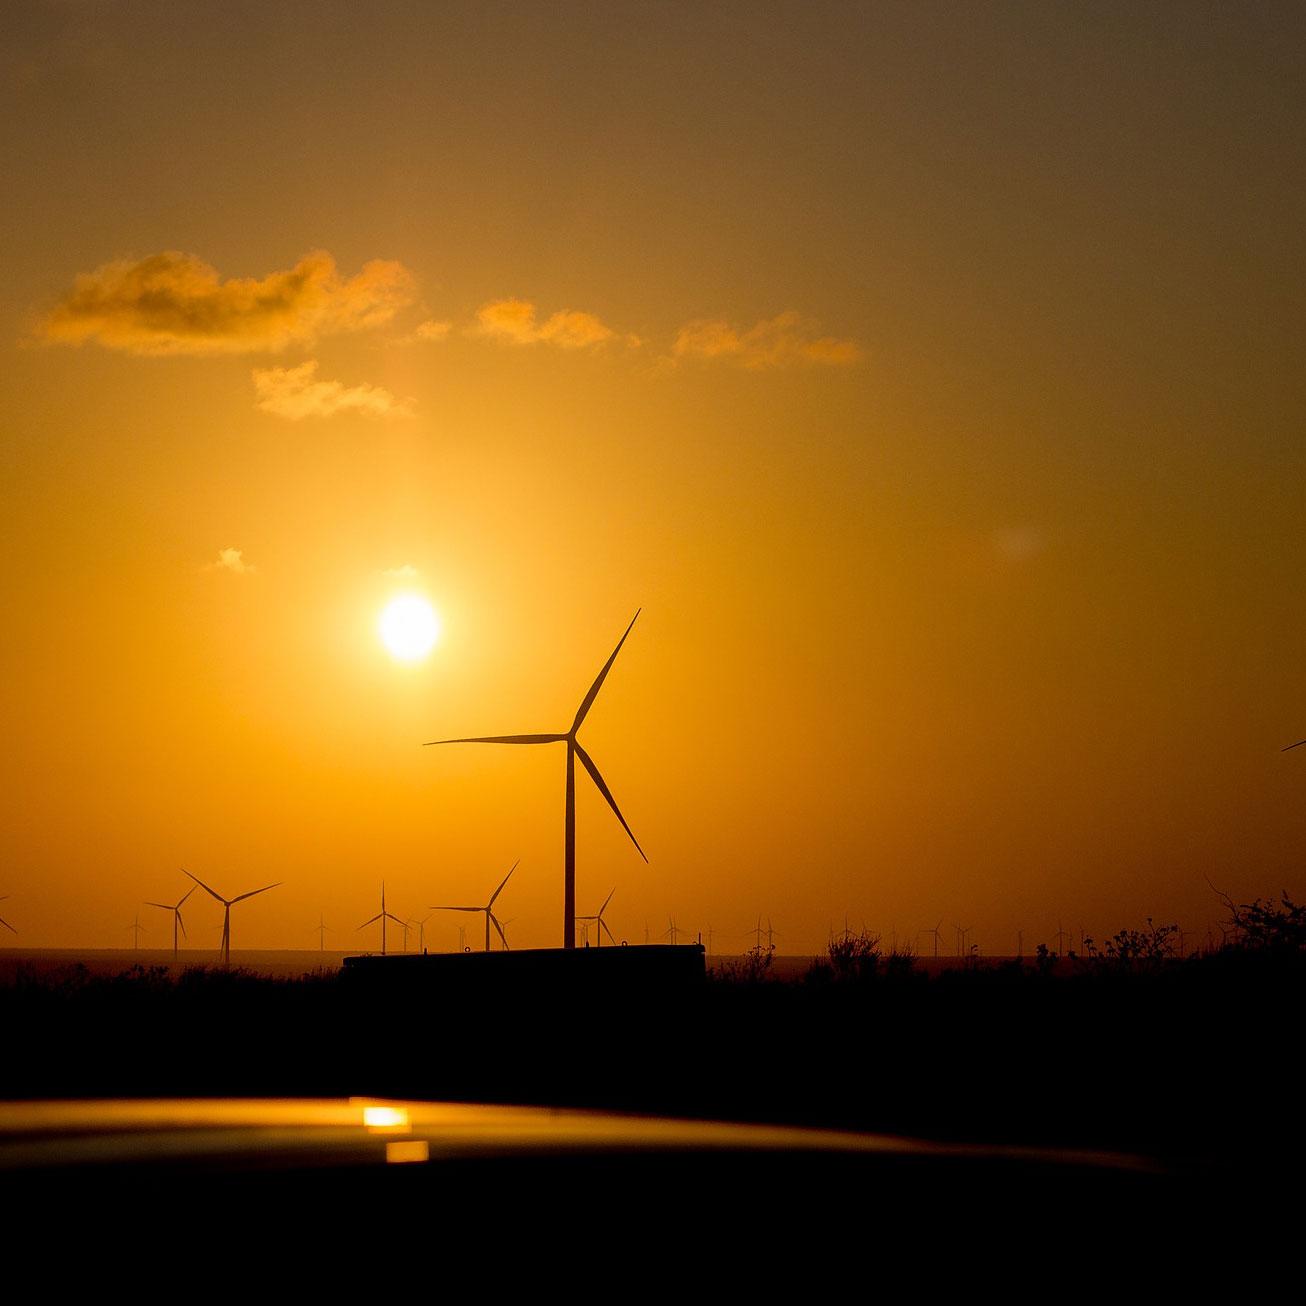 energia eolica centrales